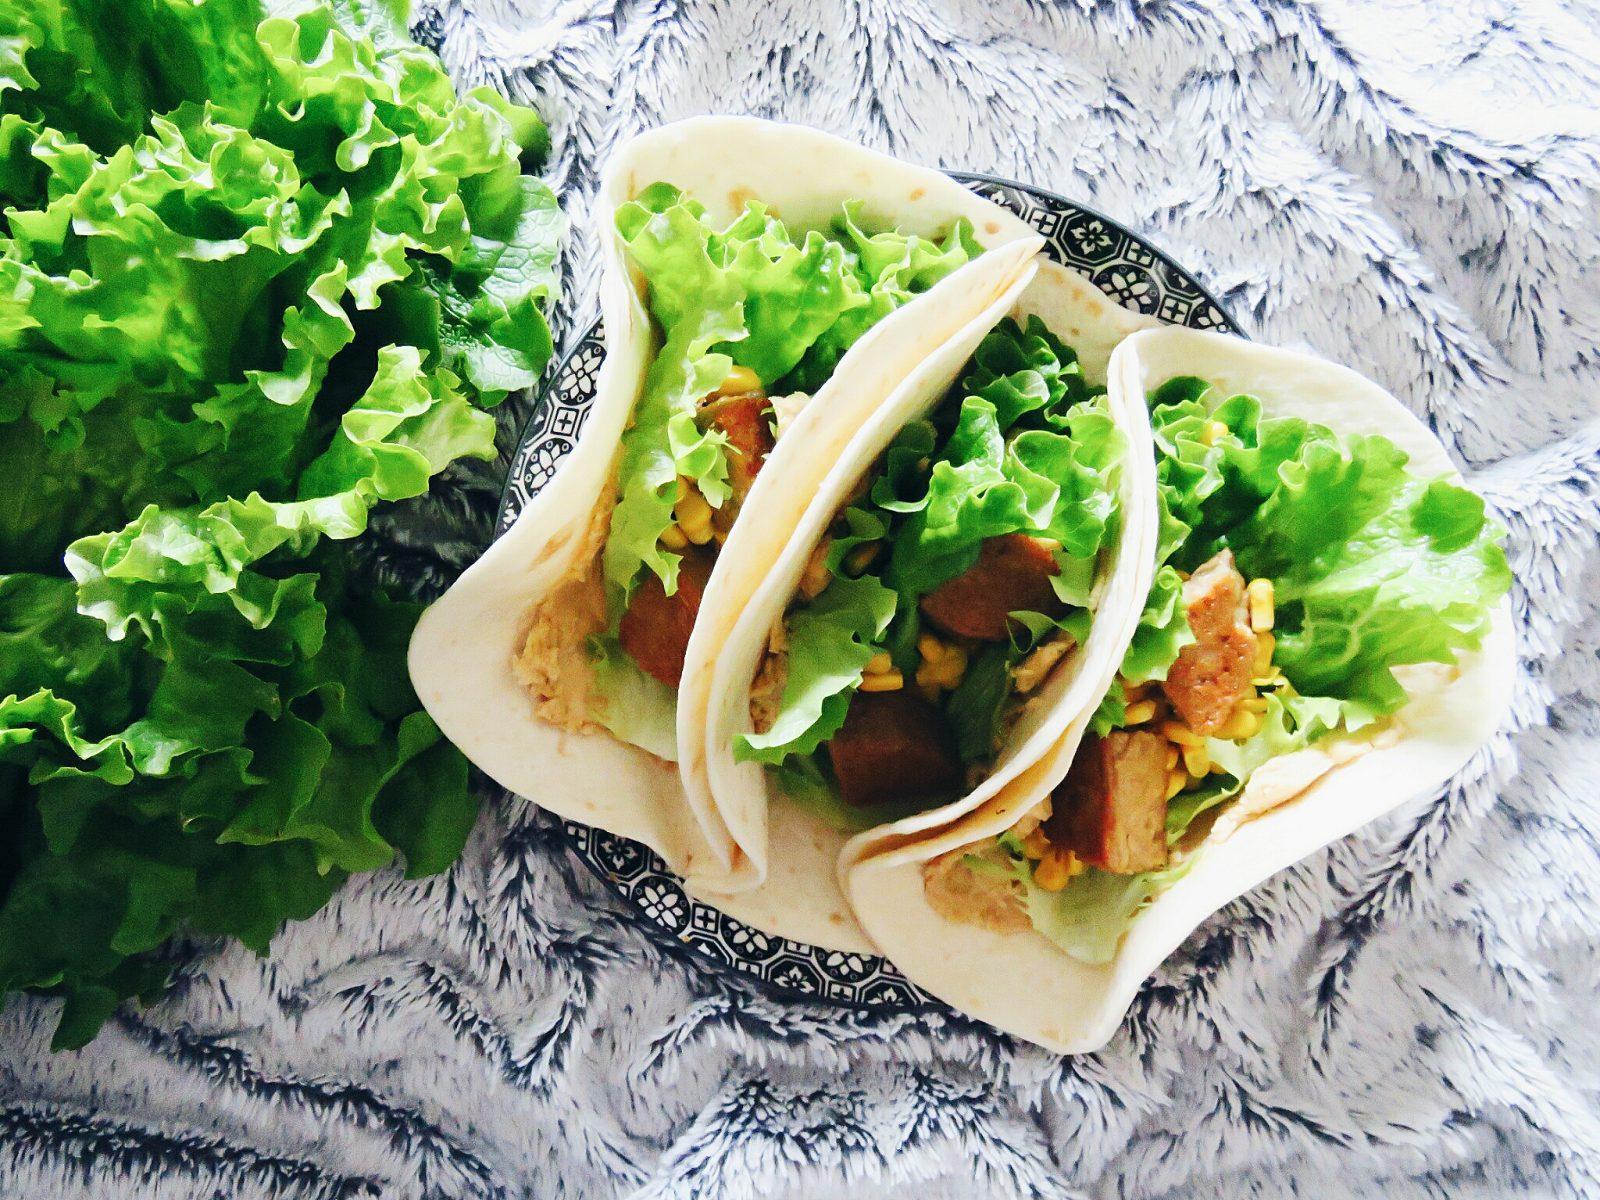 Tacos végétaliens ultra-simples